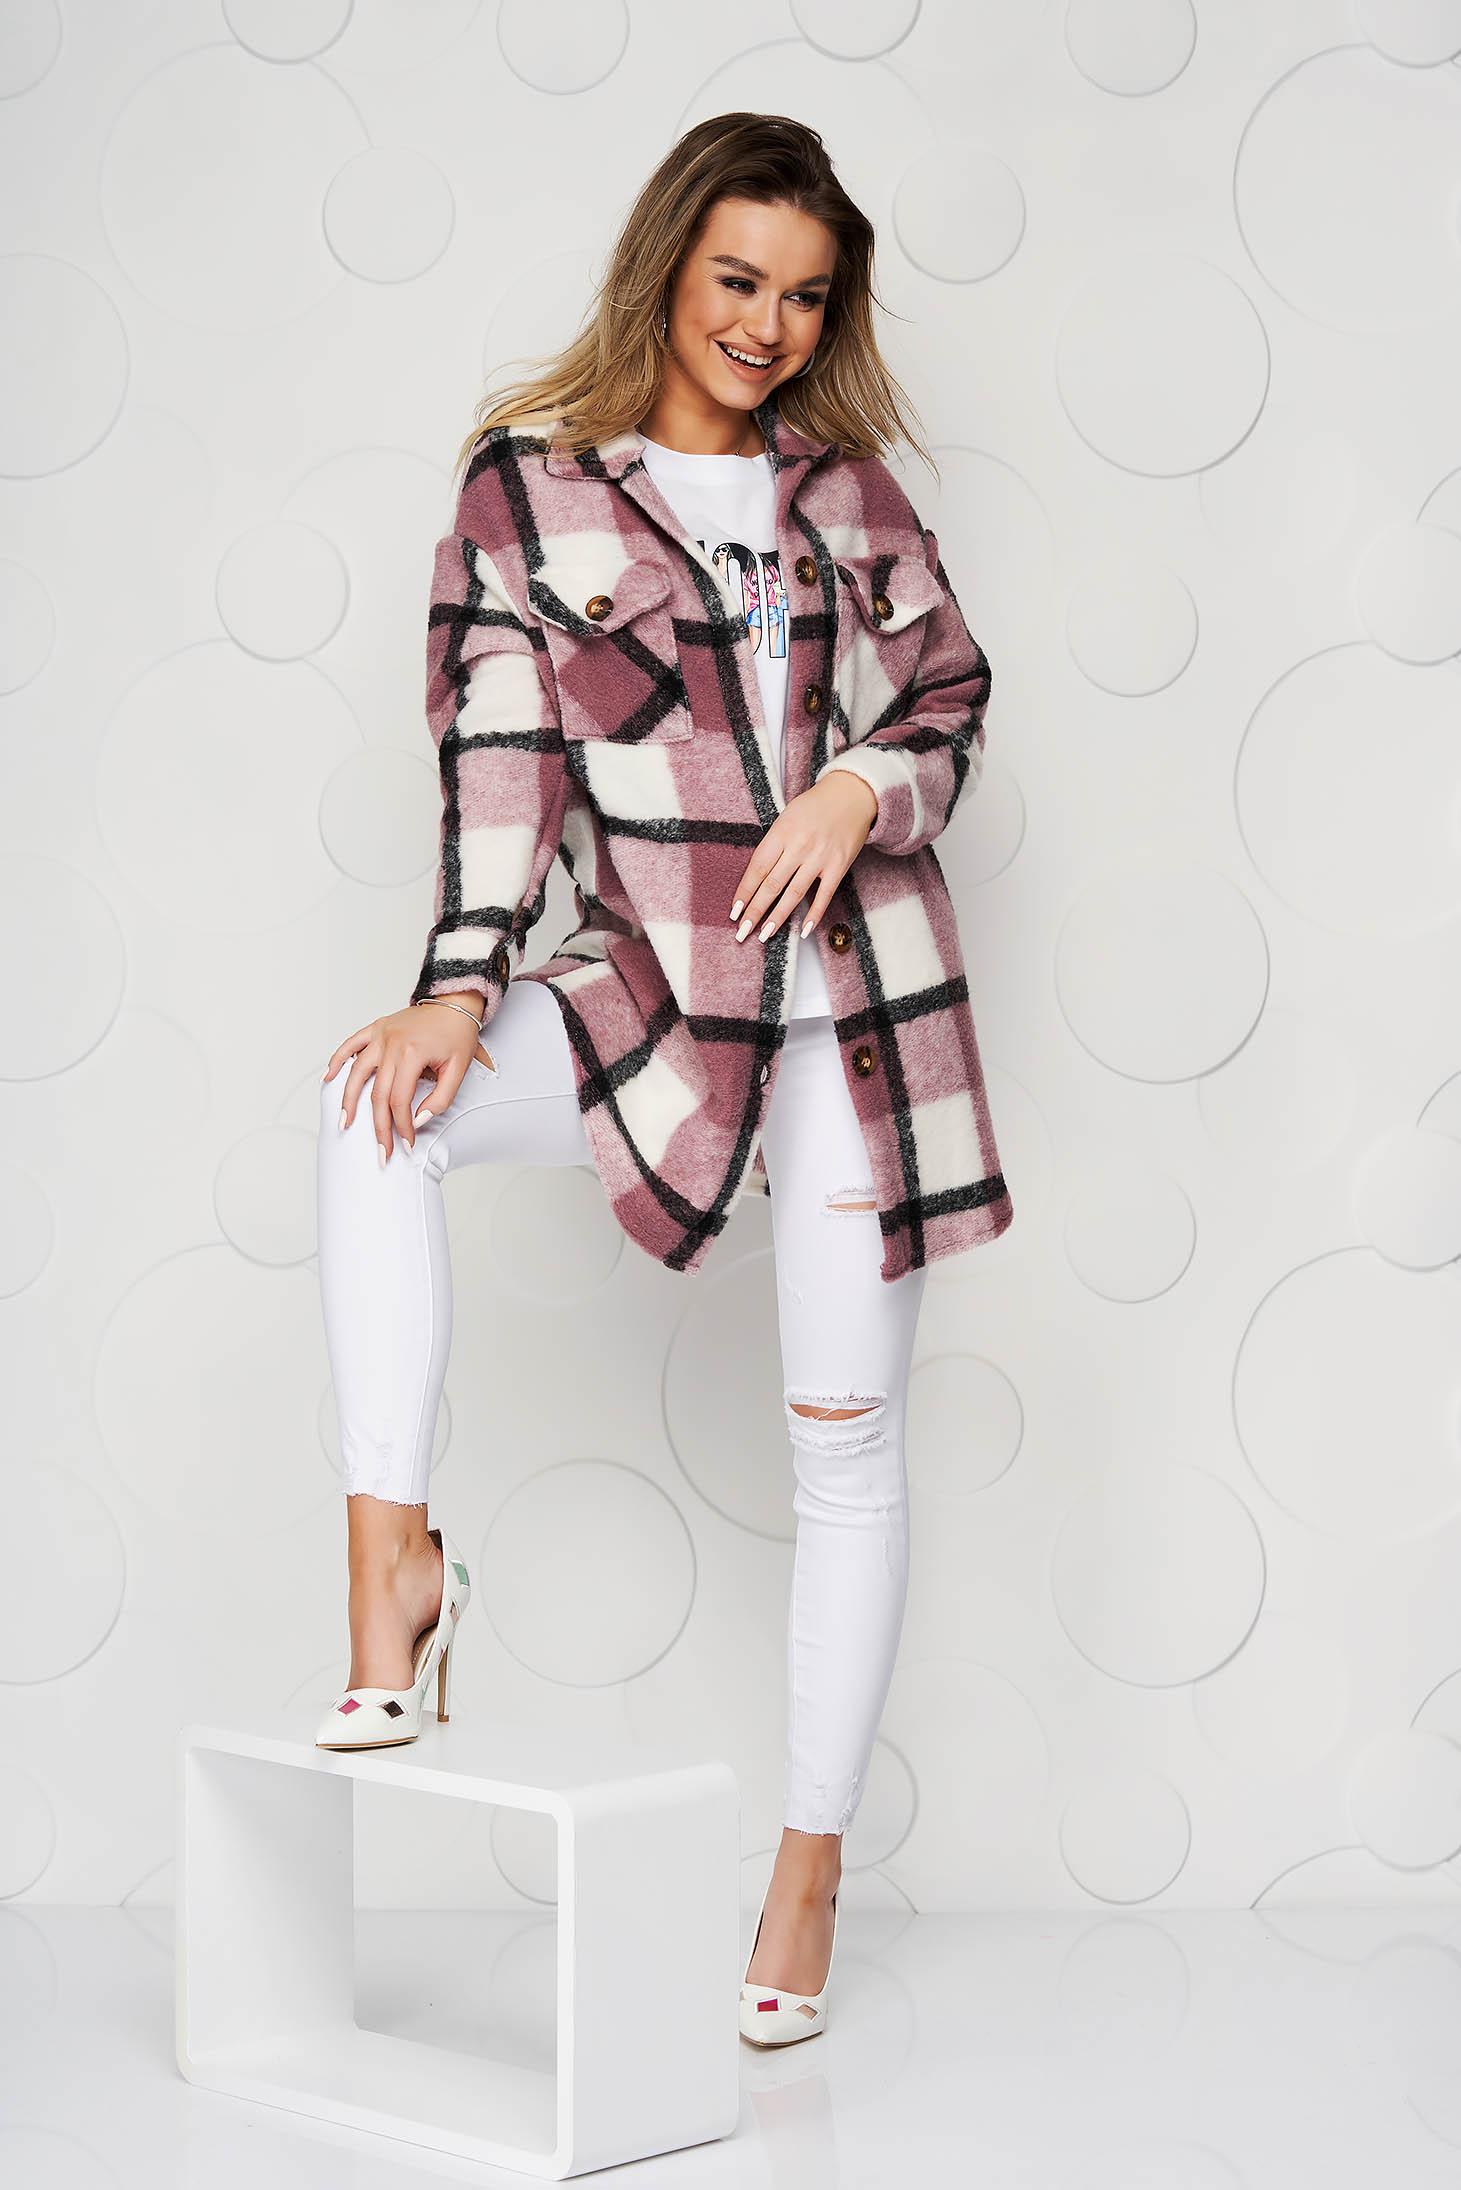 Jacheta tip camasa SunShine roz prafuit din lana cu croi larg cu buzunare in fata